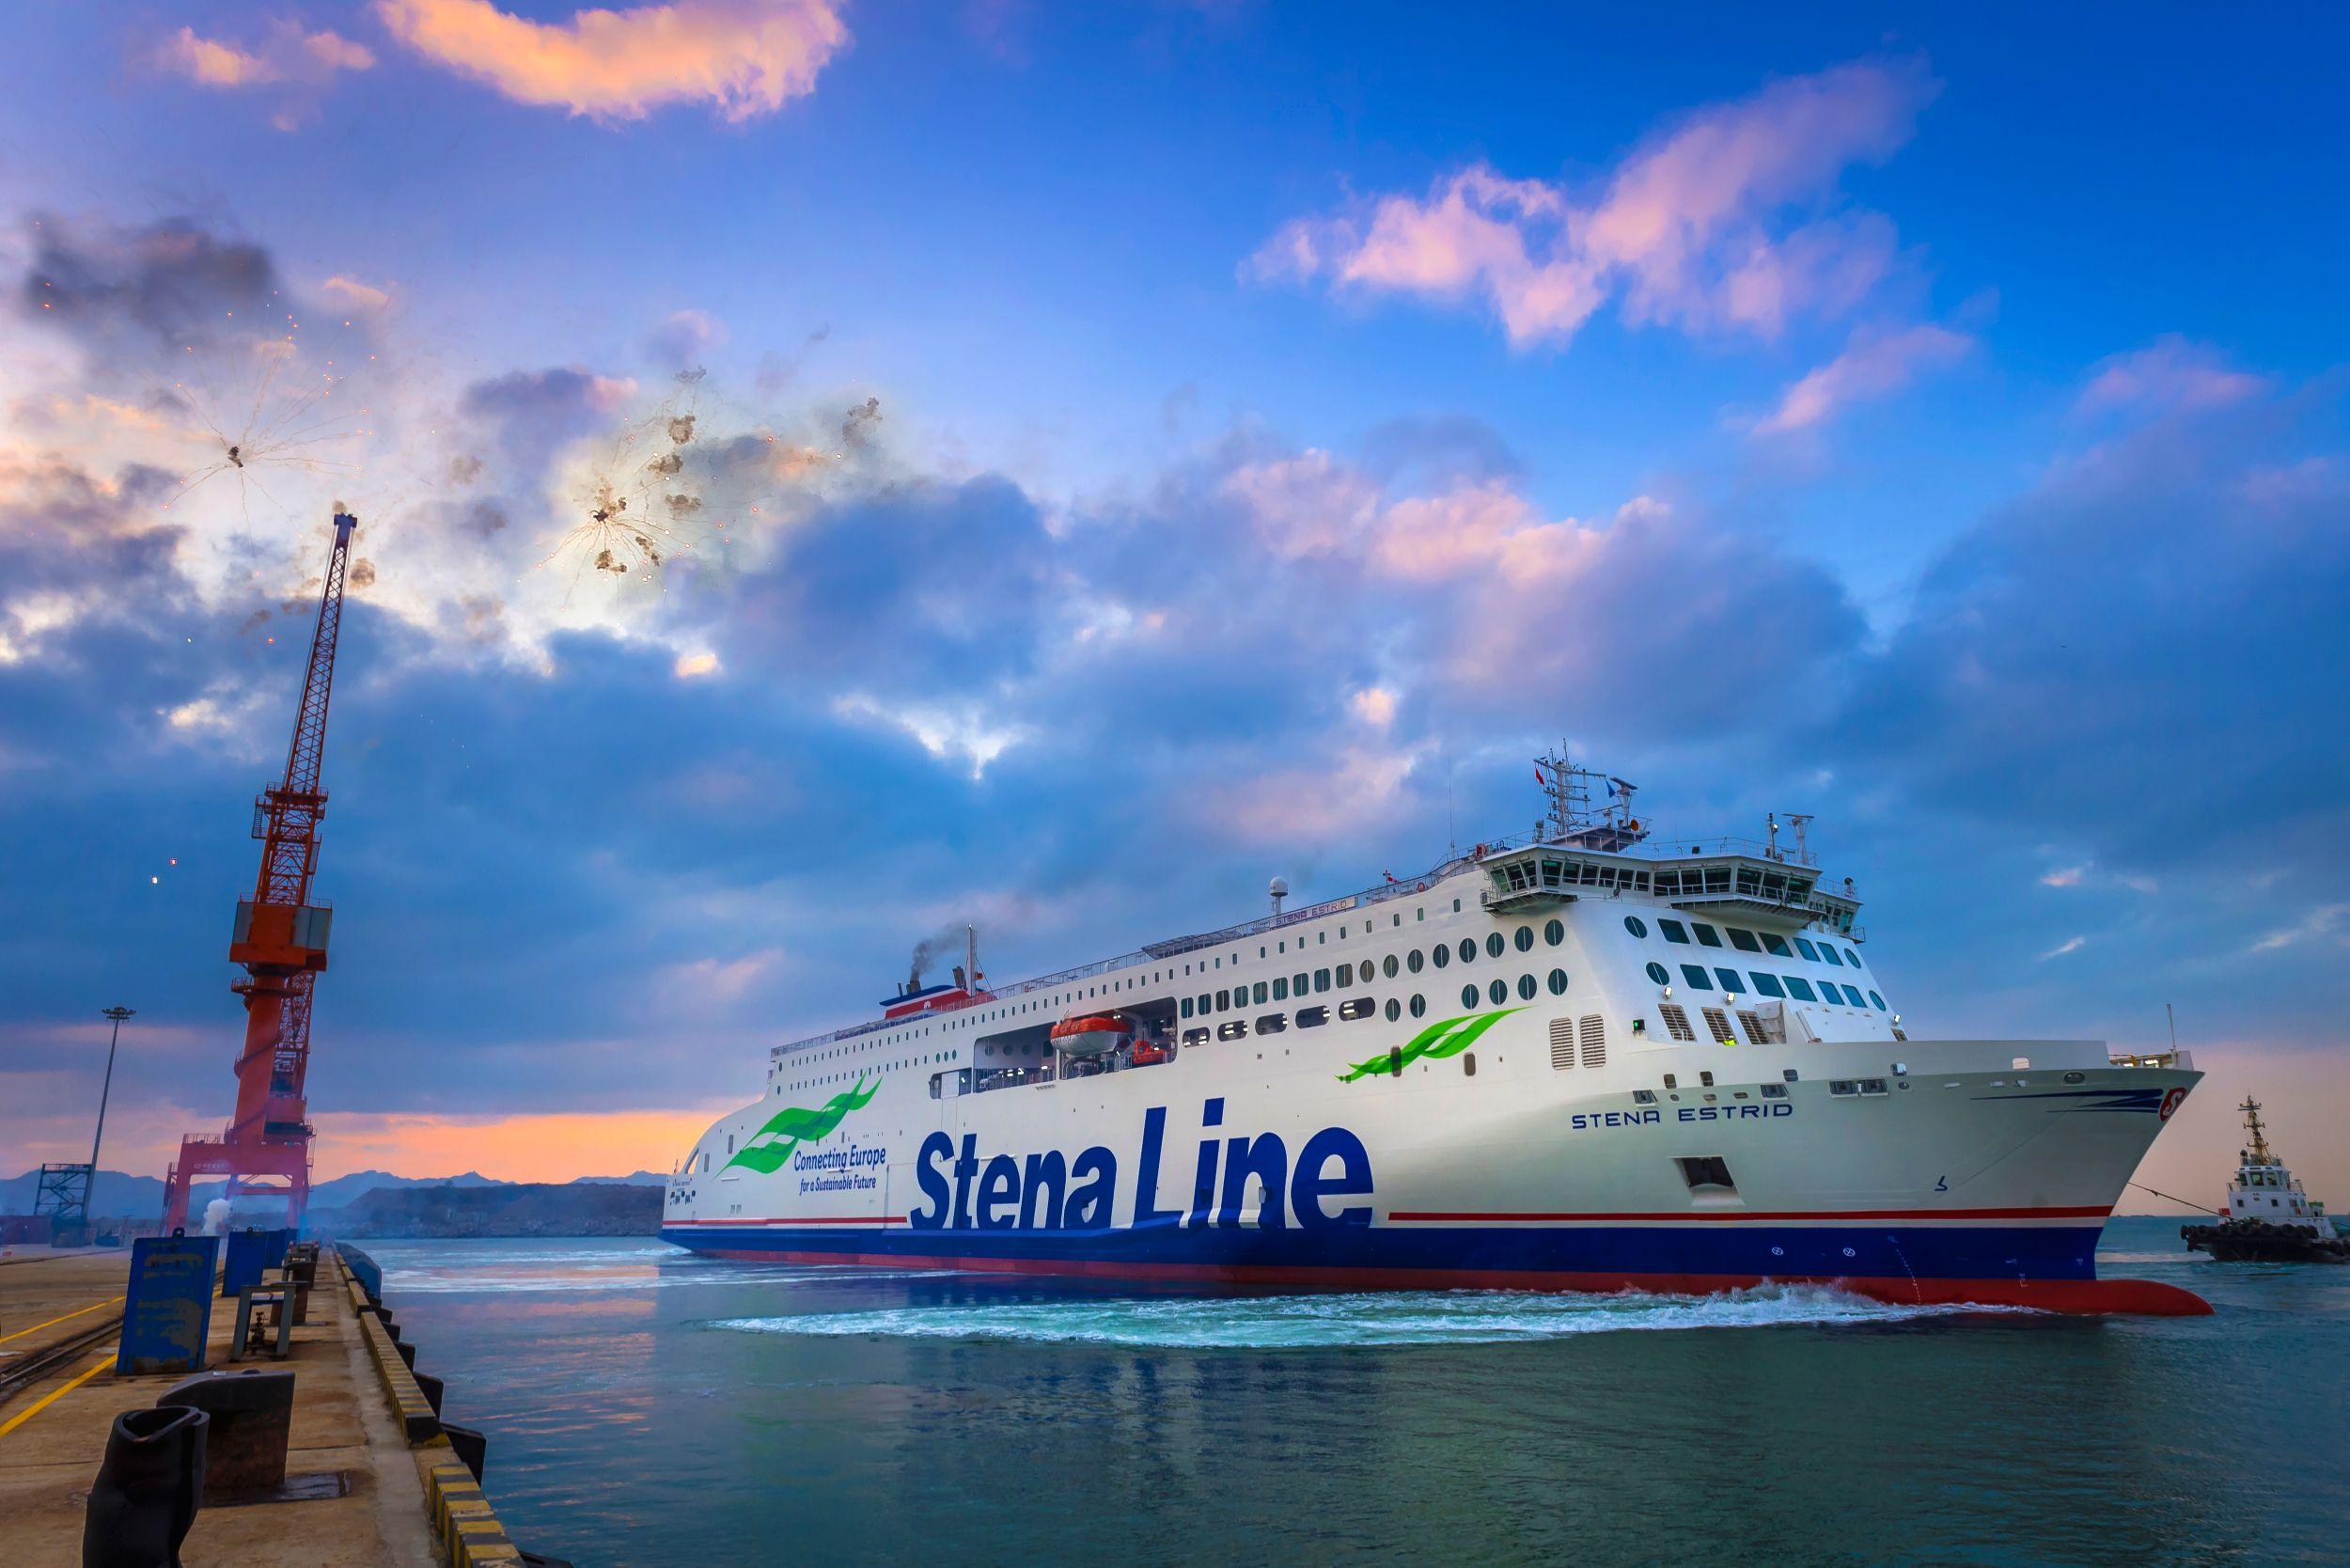 The Stena E-flexer Ferry. Image courtesy of Stena